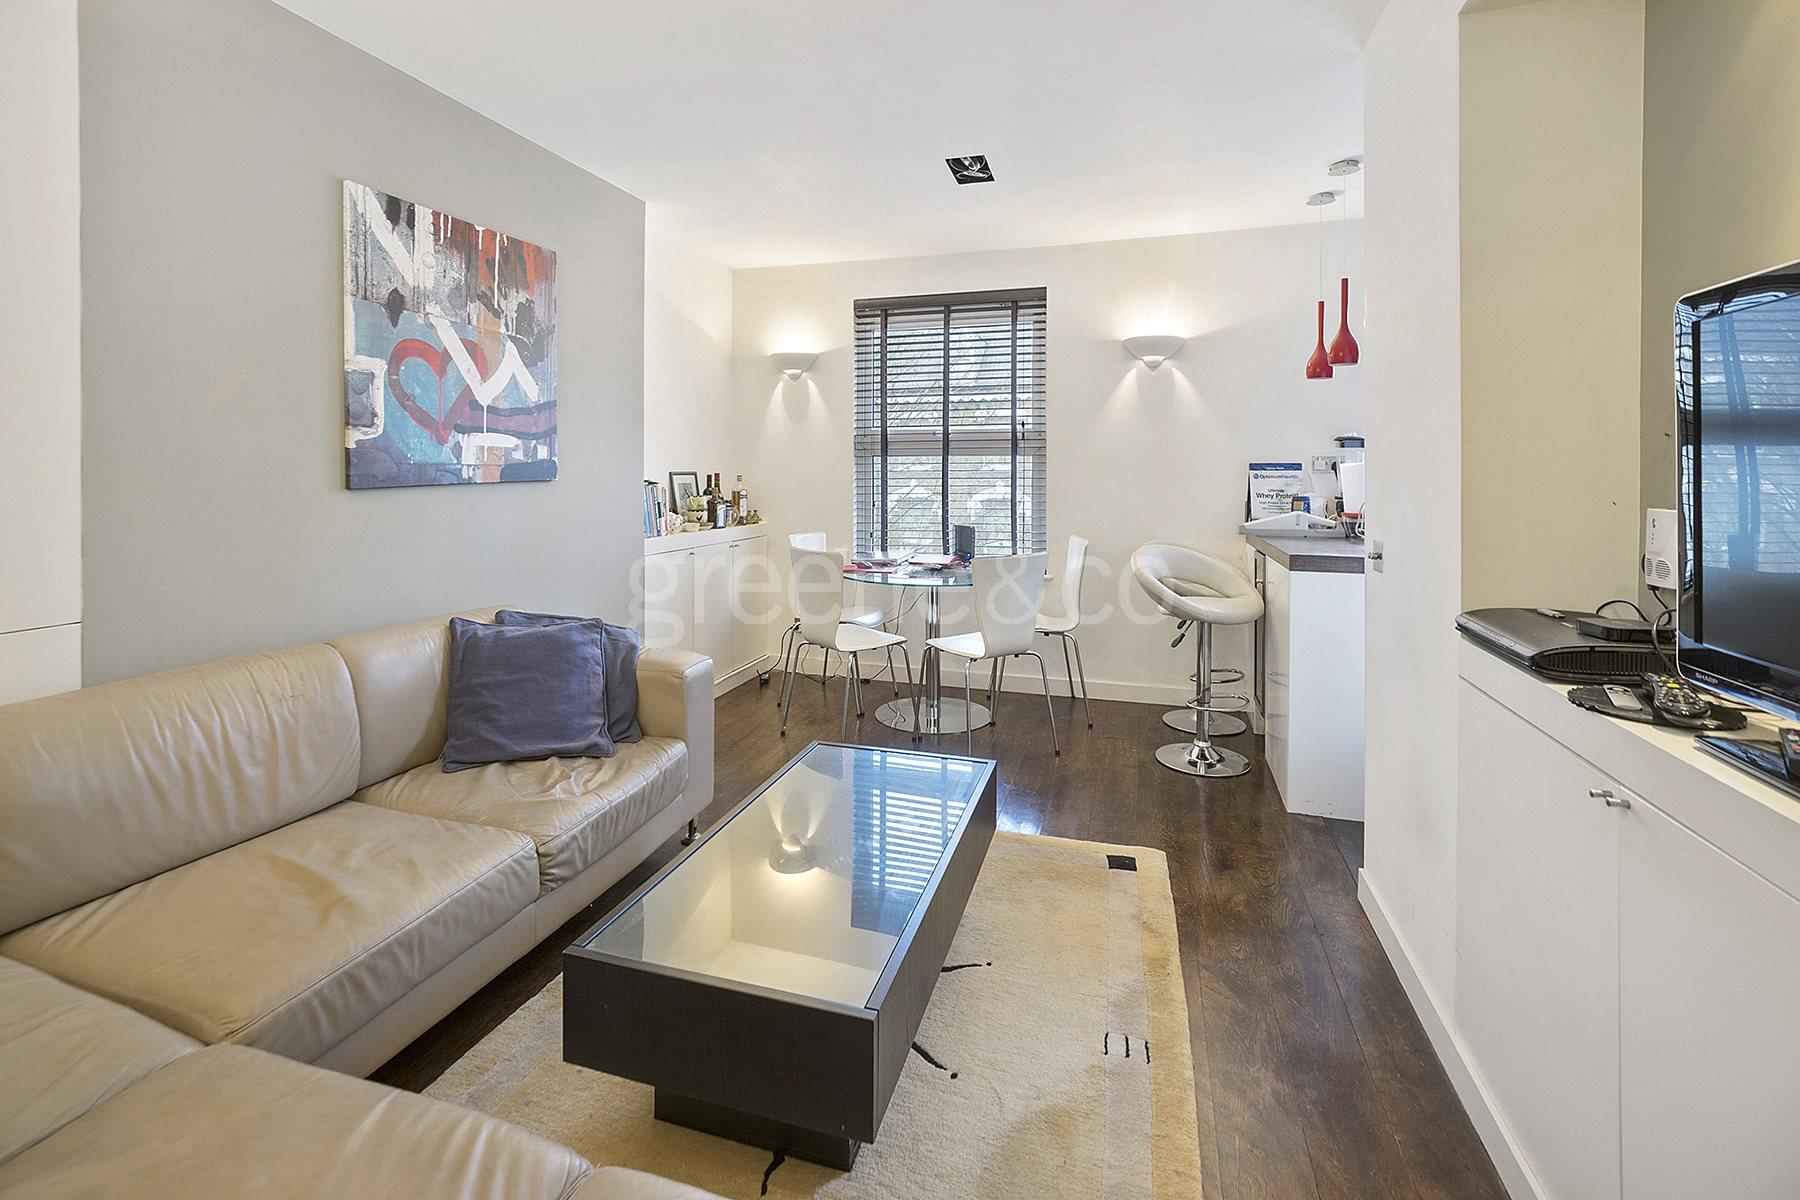 2 Bedrooms Flat for sale in St. Julians Road, Kilburn, London, NW6